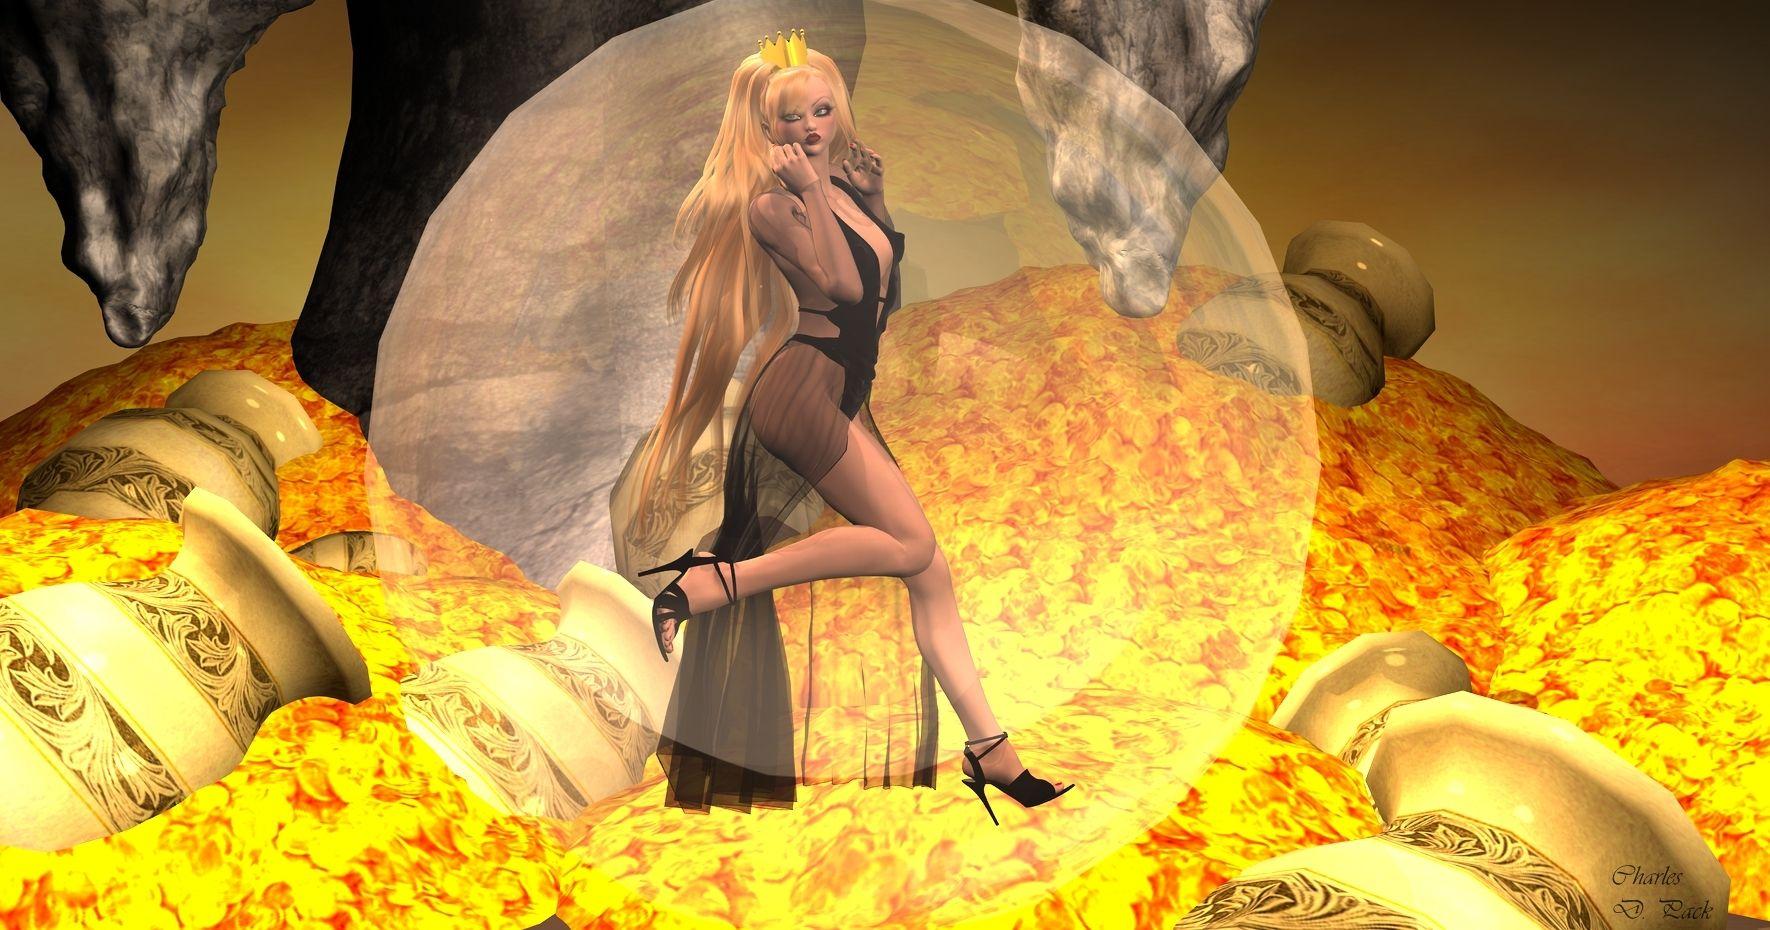 Princess daphne dragon 39 s lair princess daphne for Dragon s lair